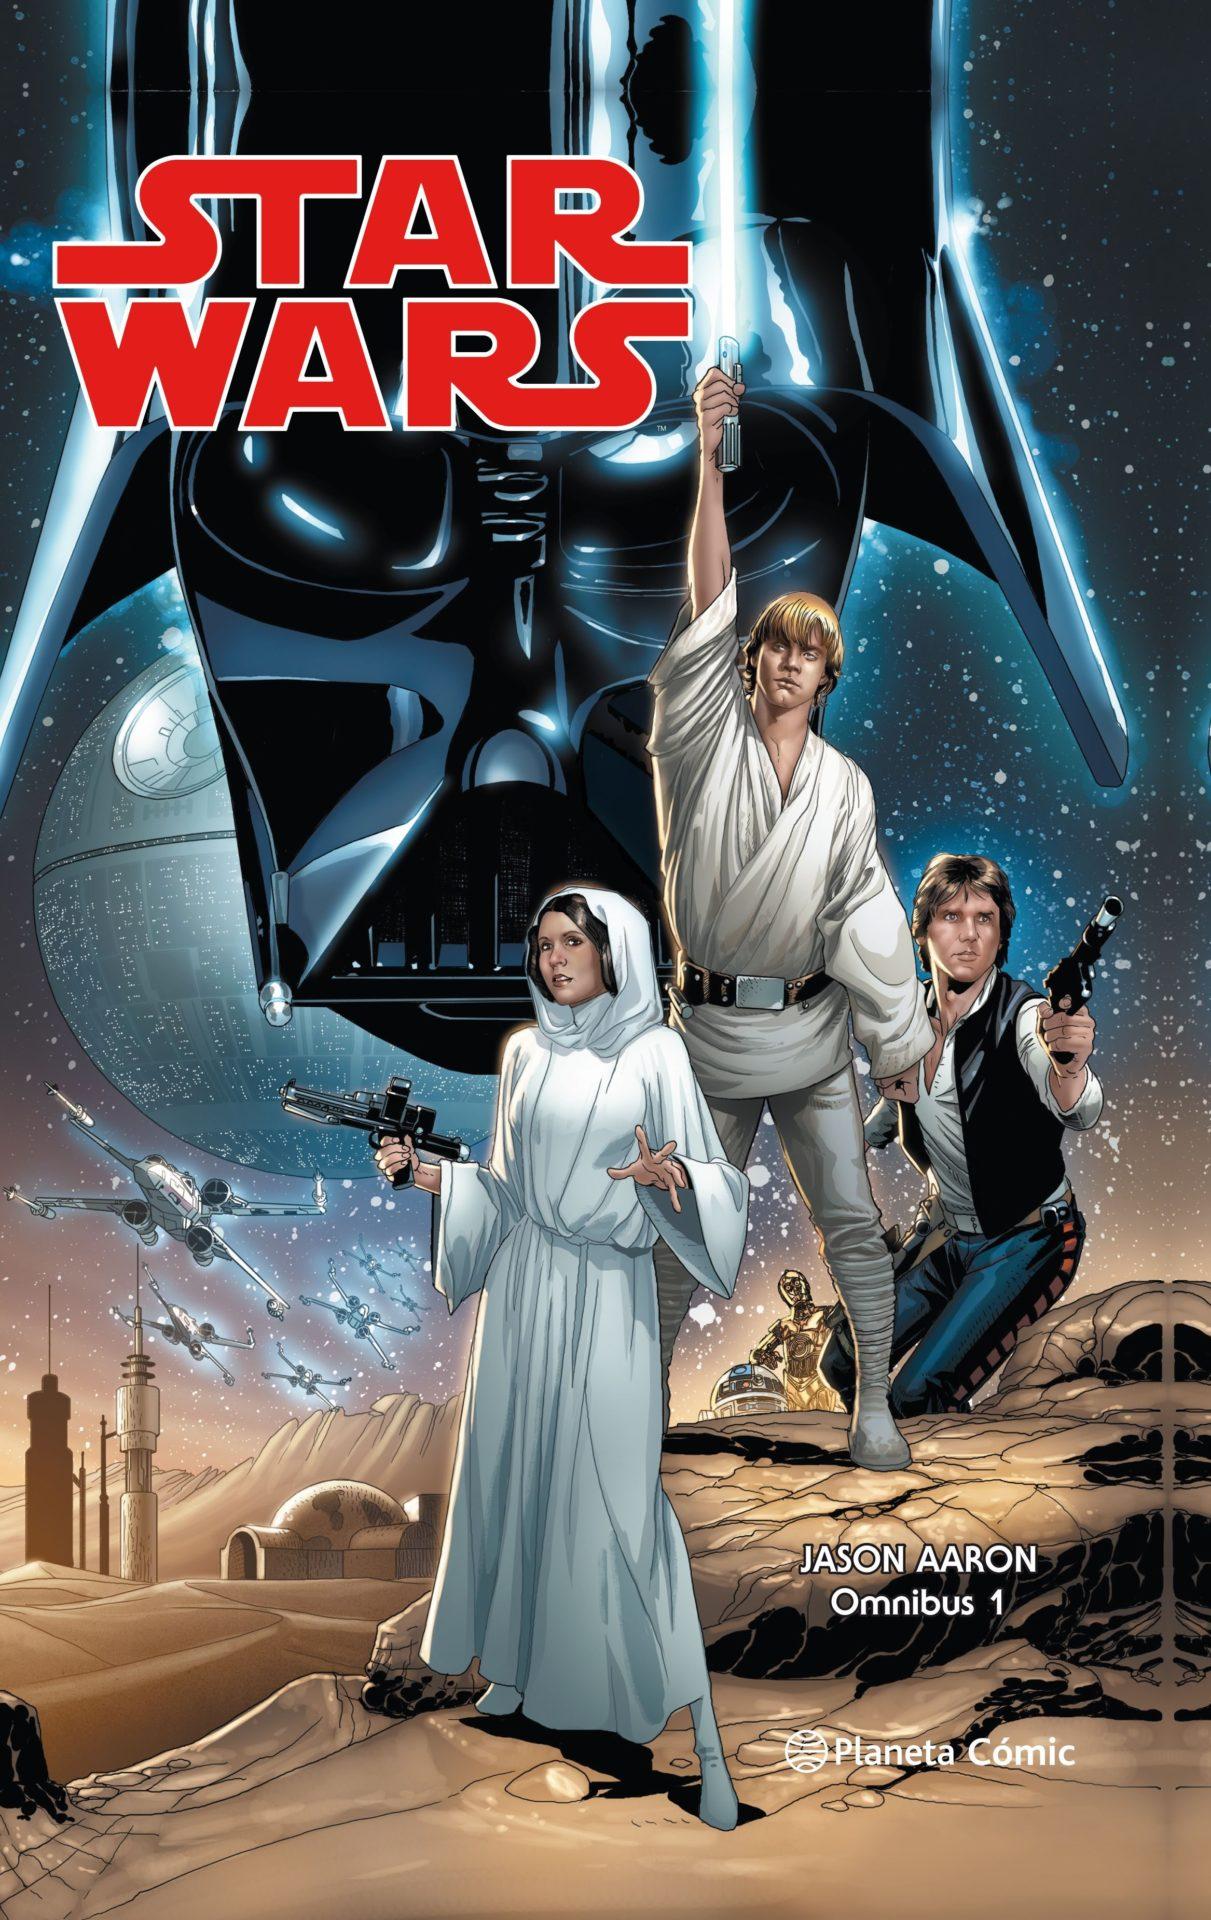 star wars jason aaron omnibus 1